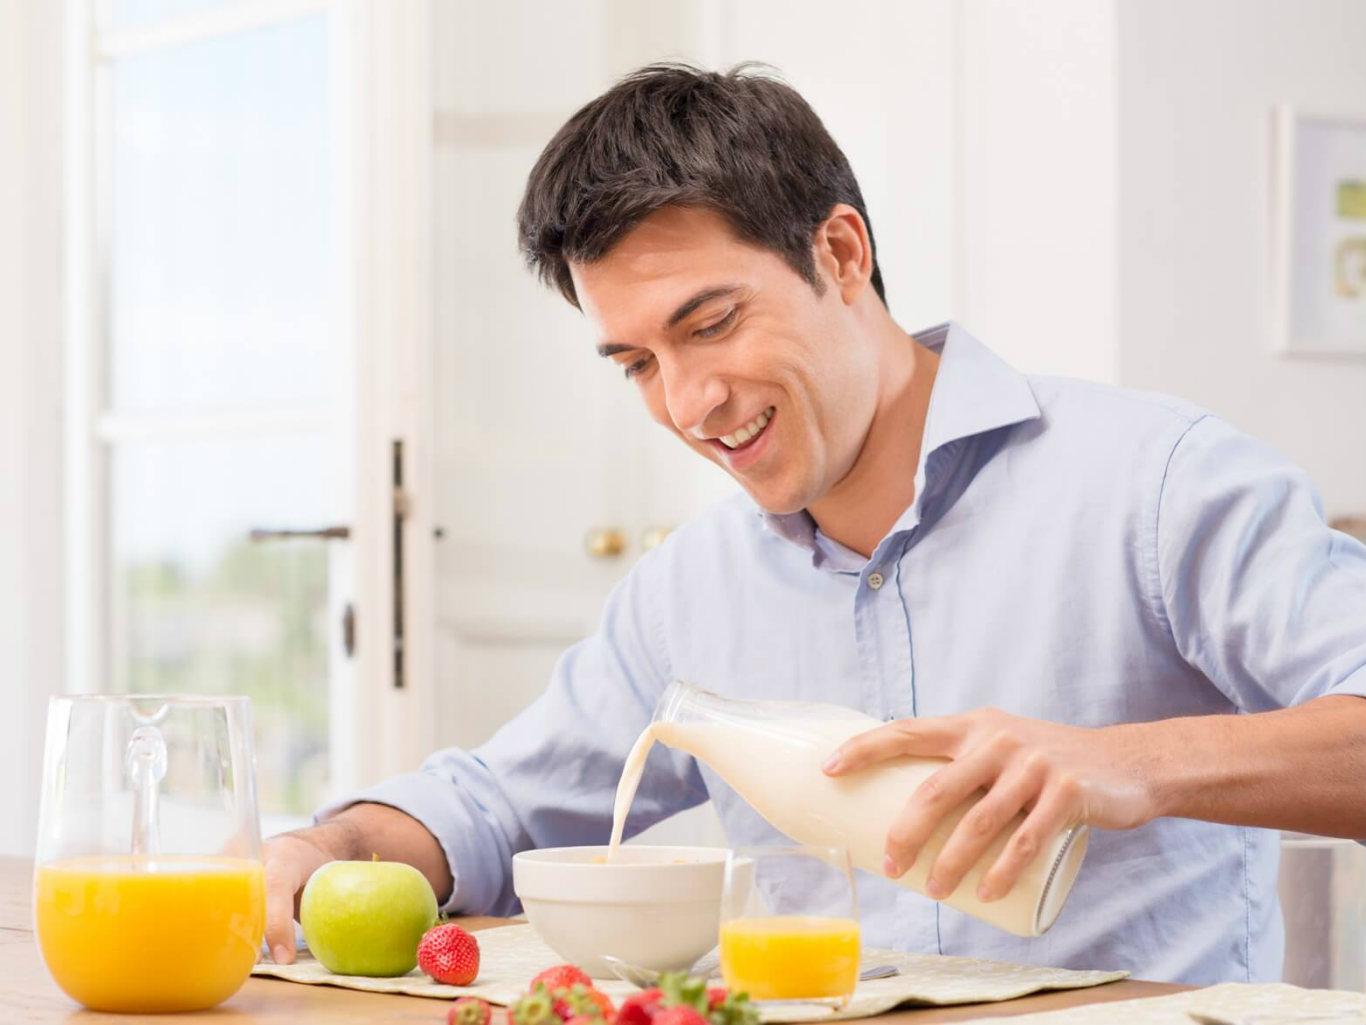 крепеж фото мужчина обедает представляют